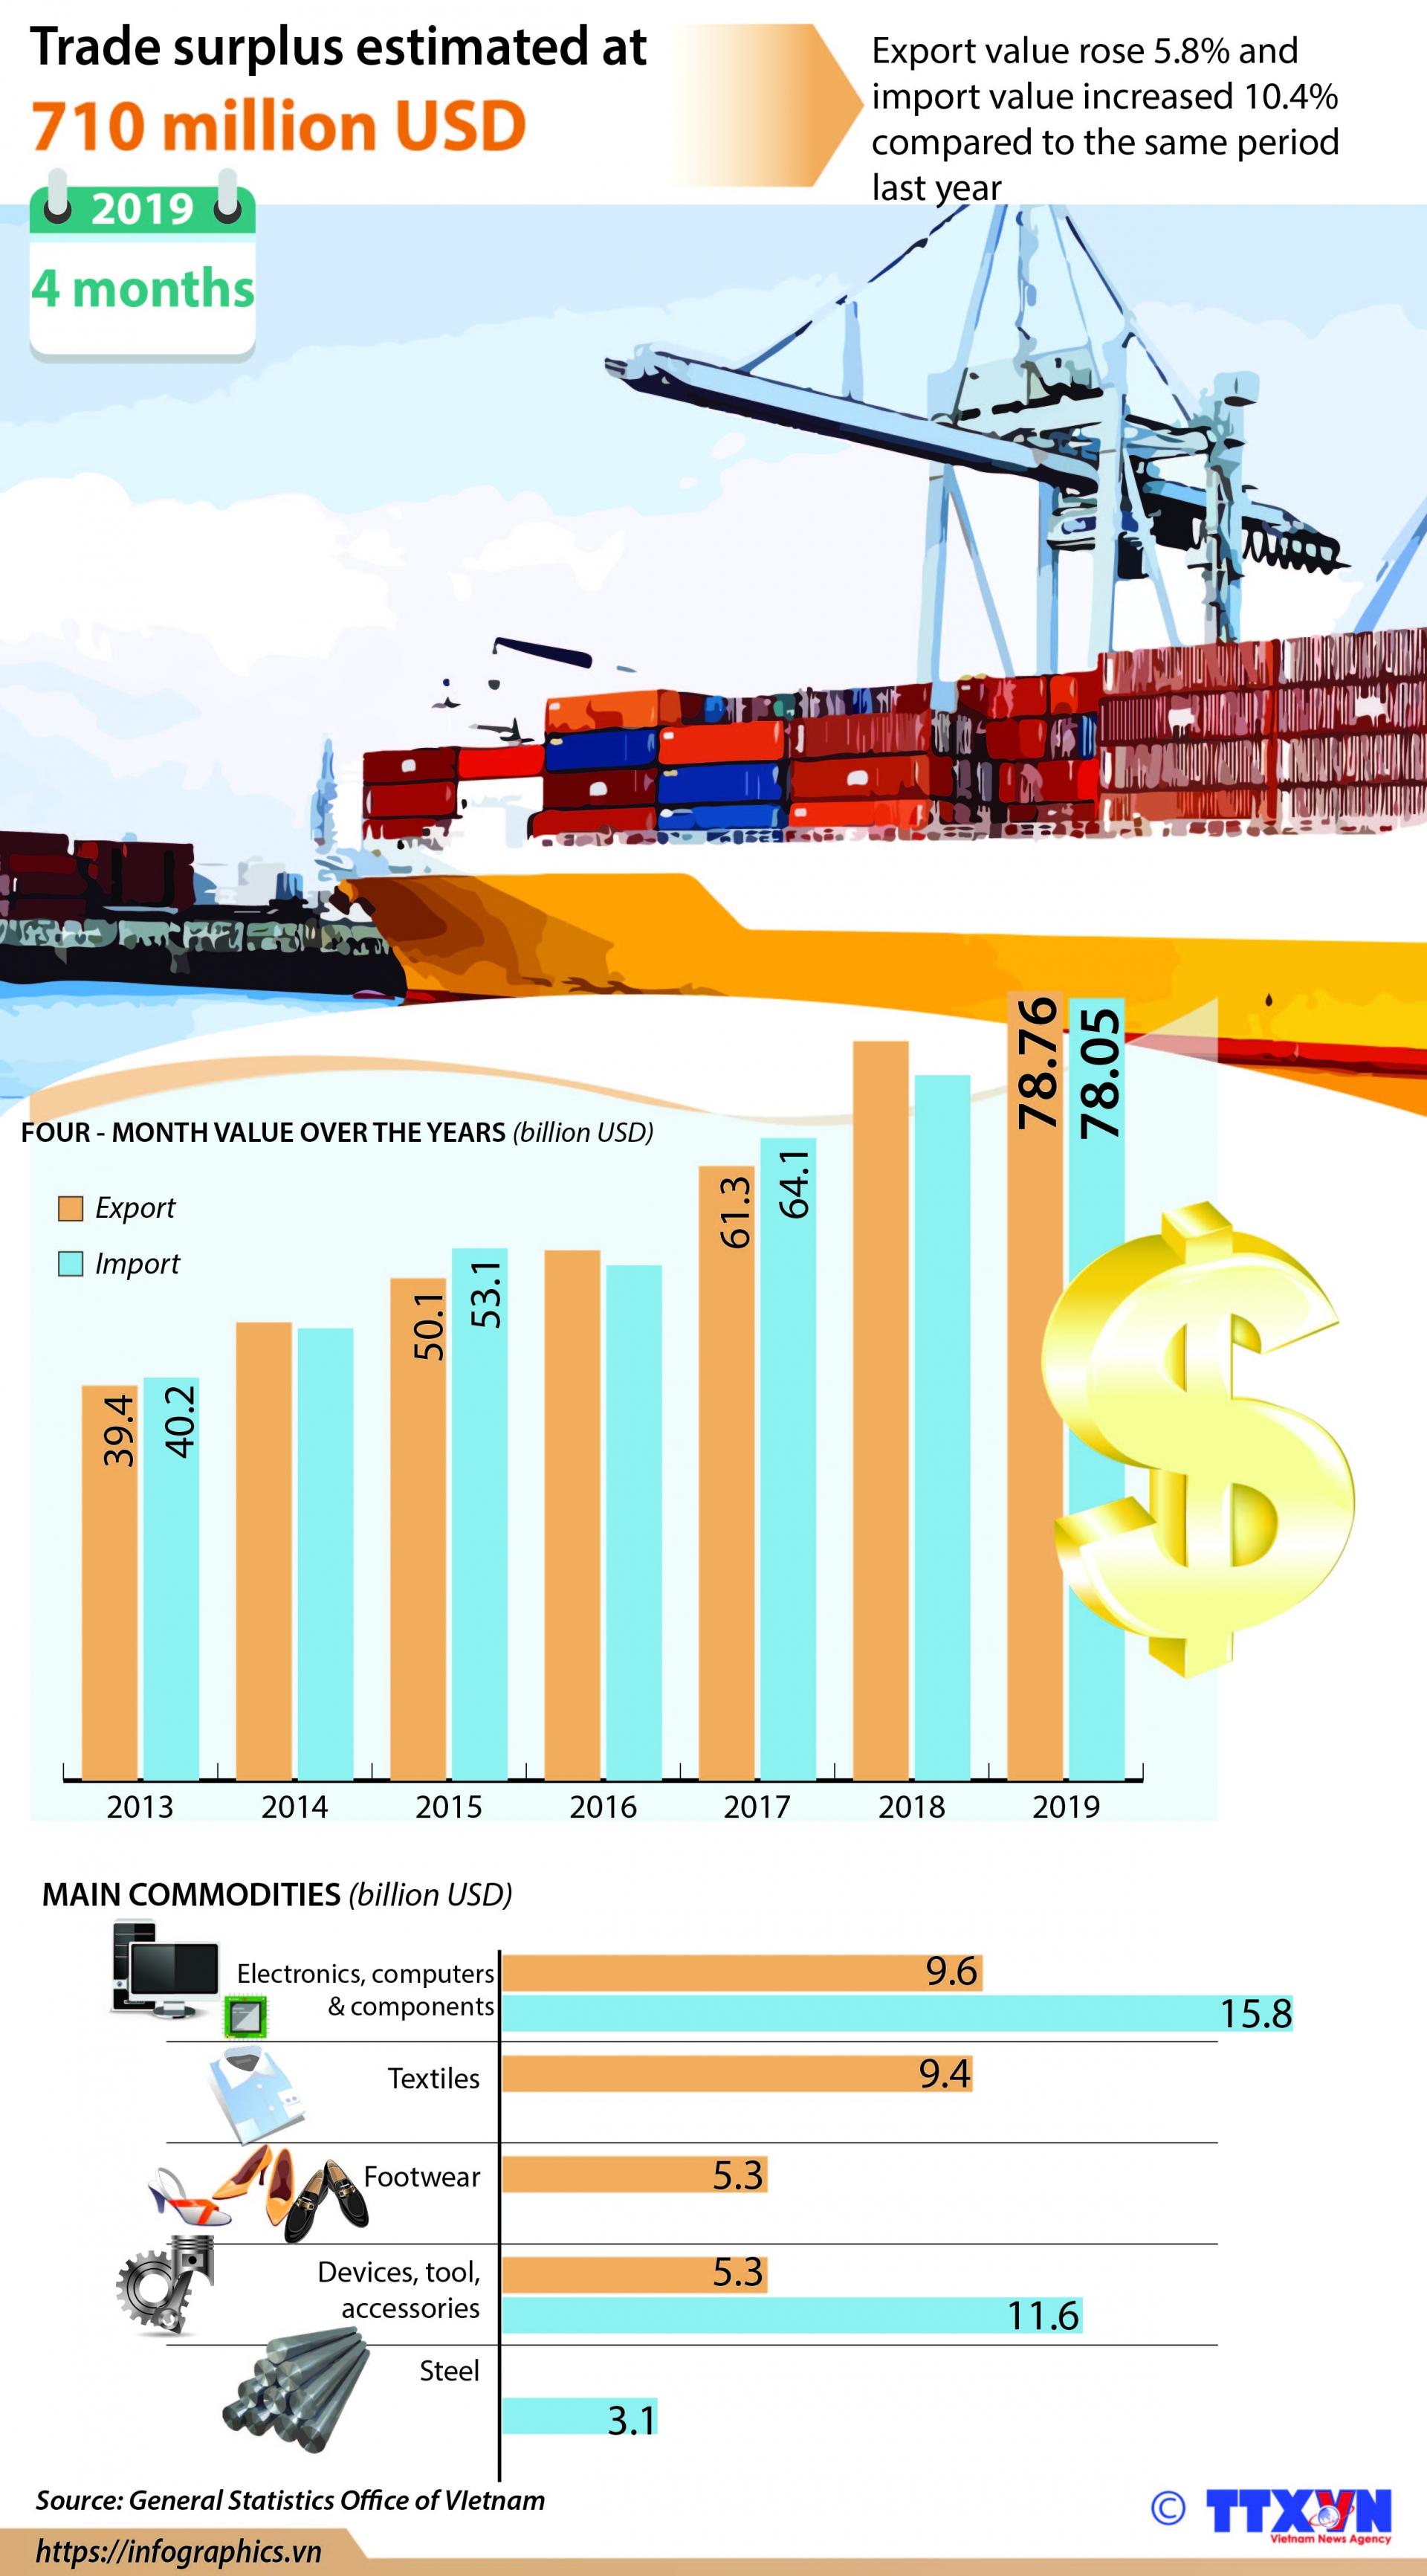 trade surplus estimated at 710 million usd